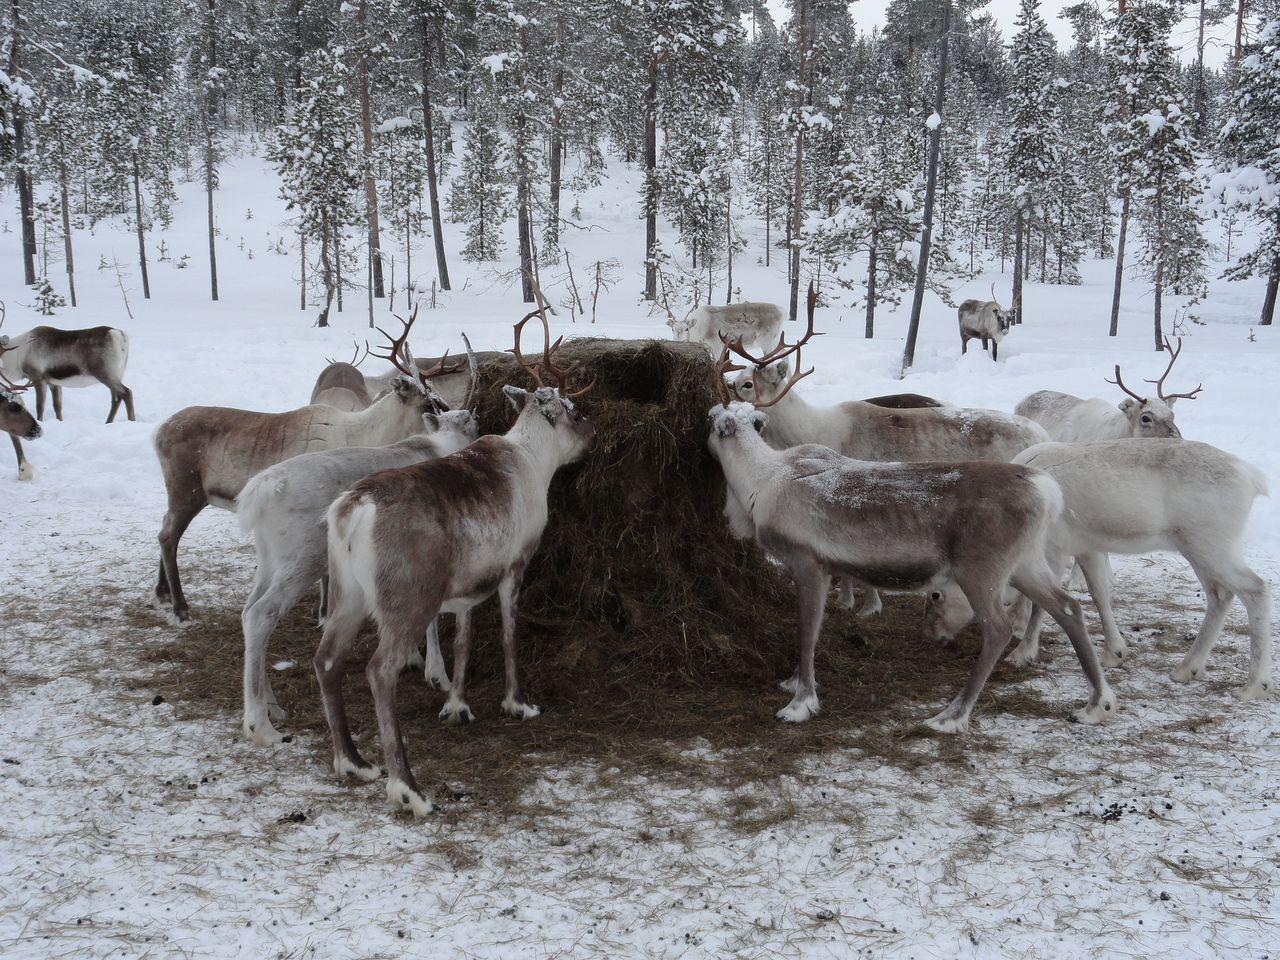 Samer tvingas stödmata djuren under vintern